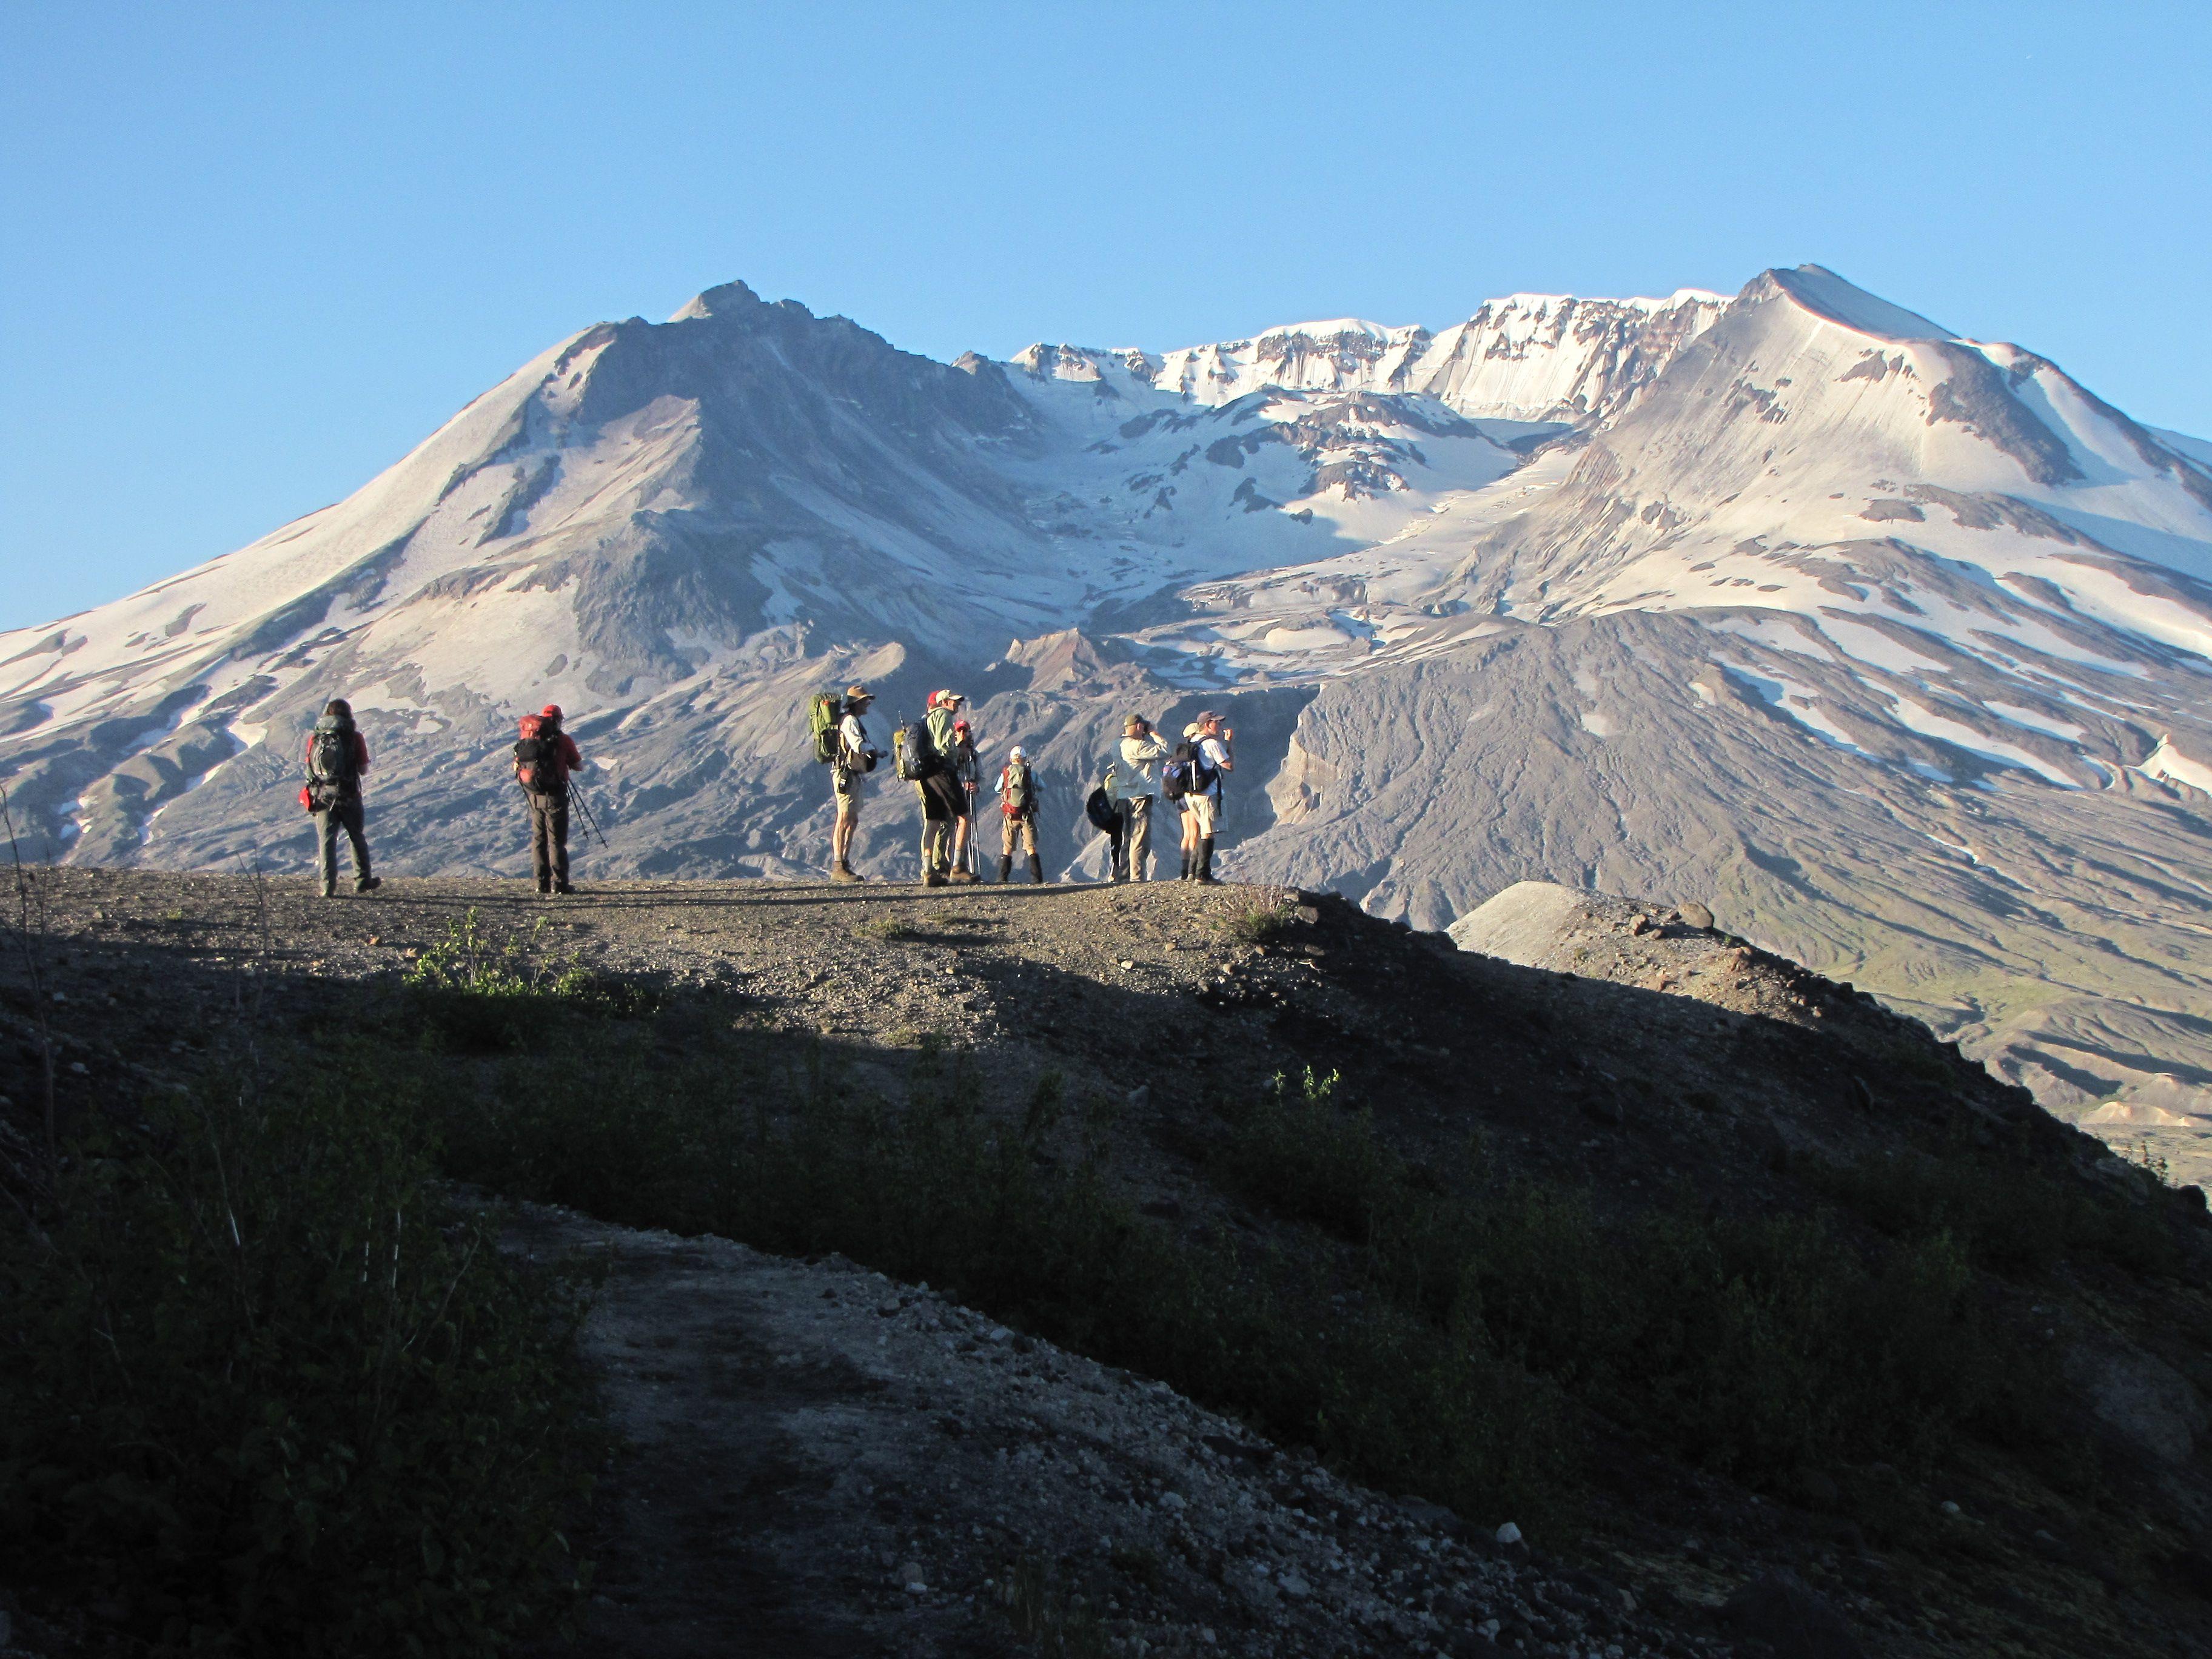 Eruption Hike